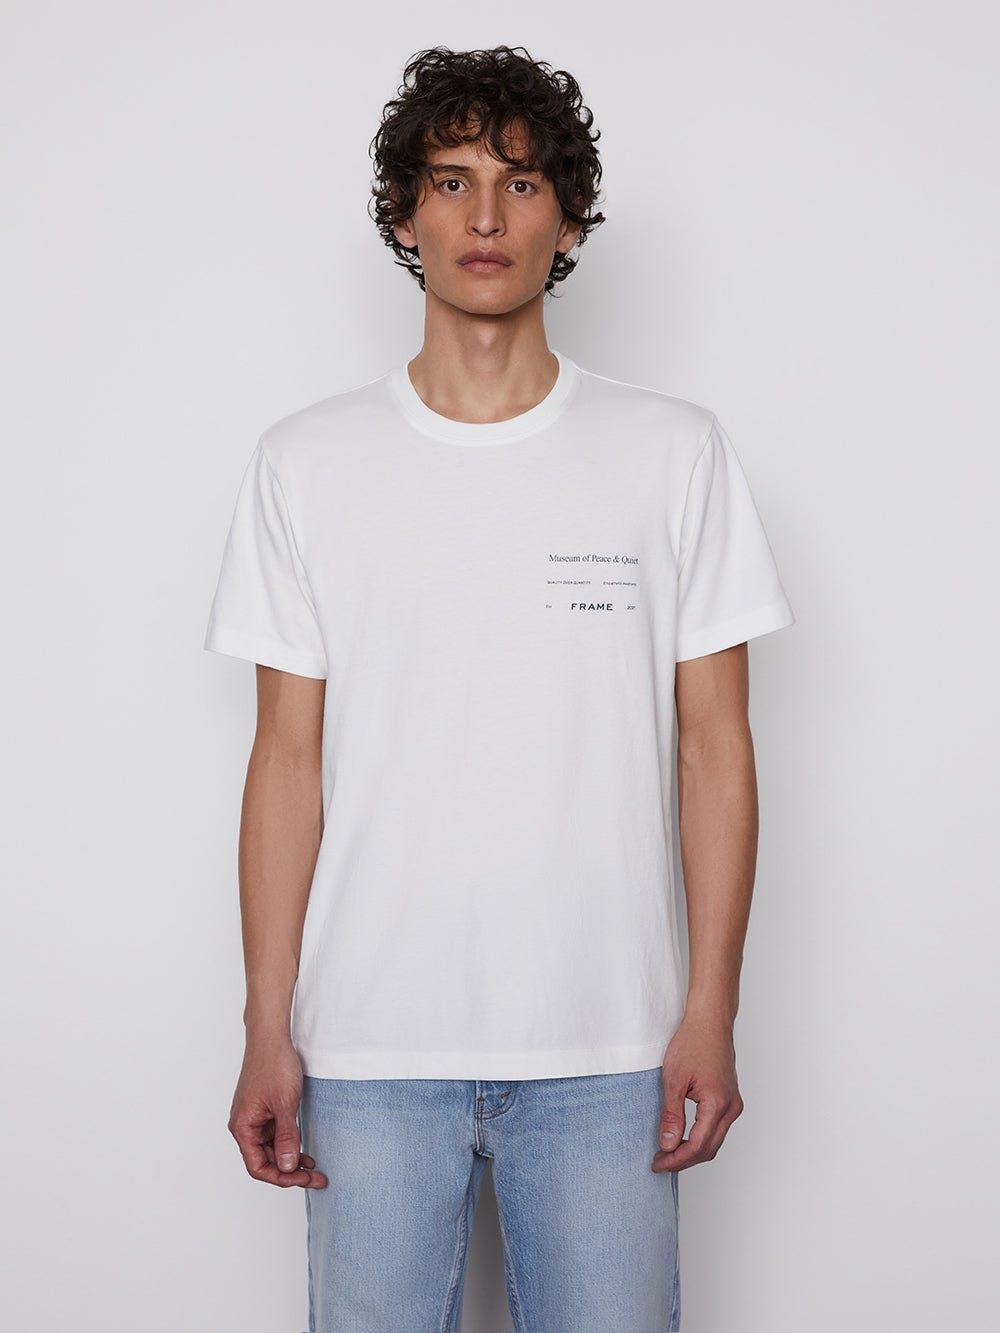 shirt front view alt:hover